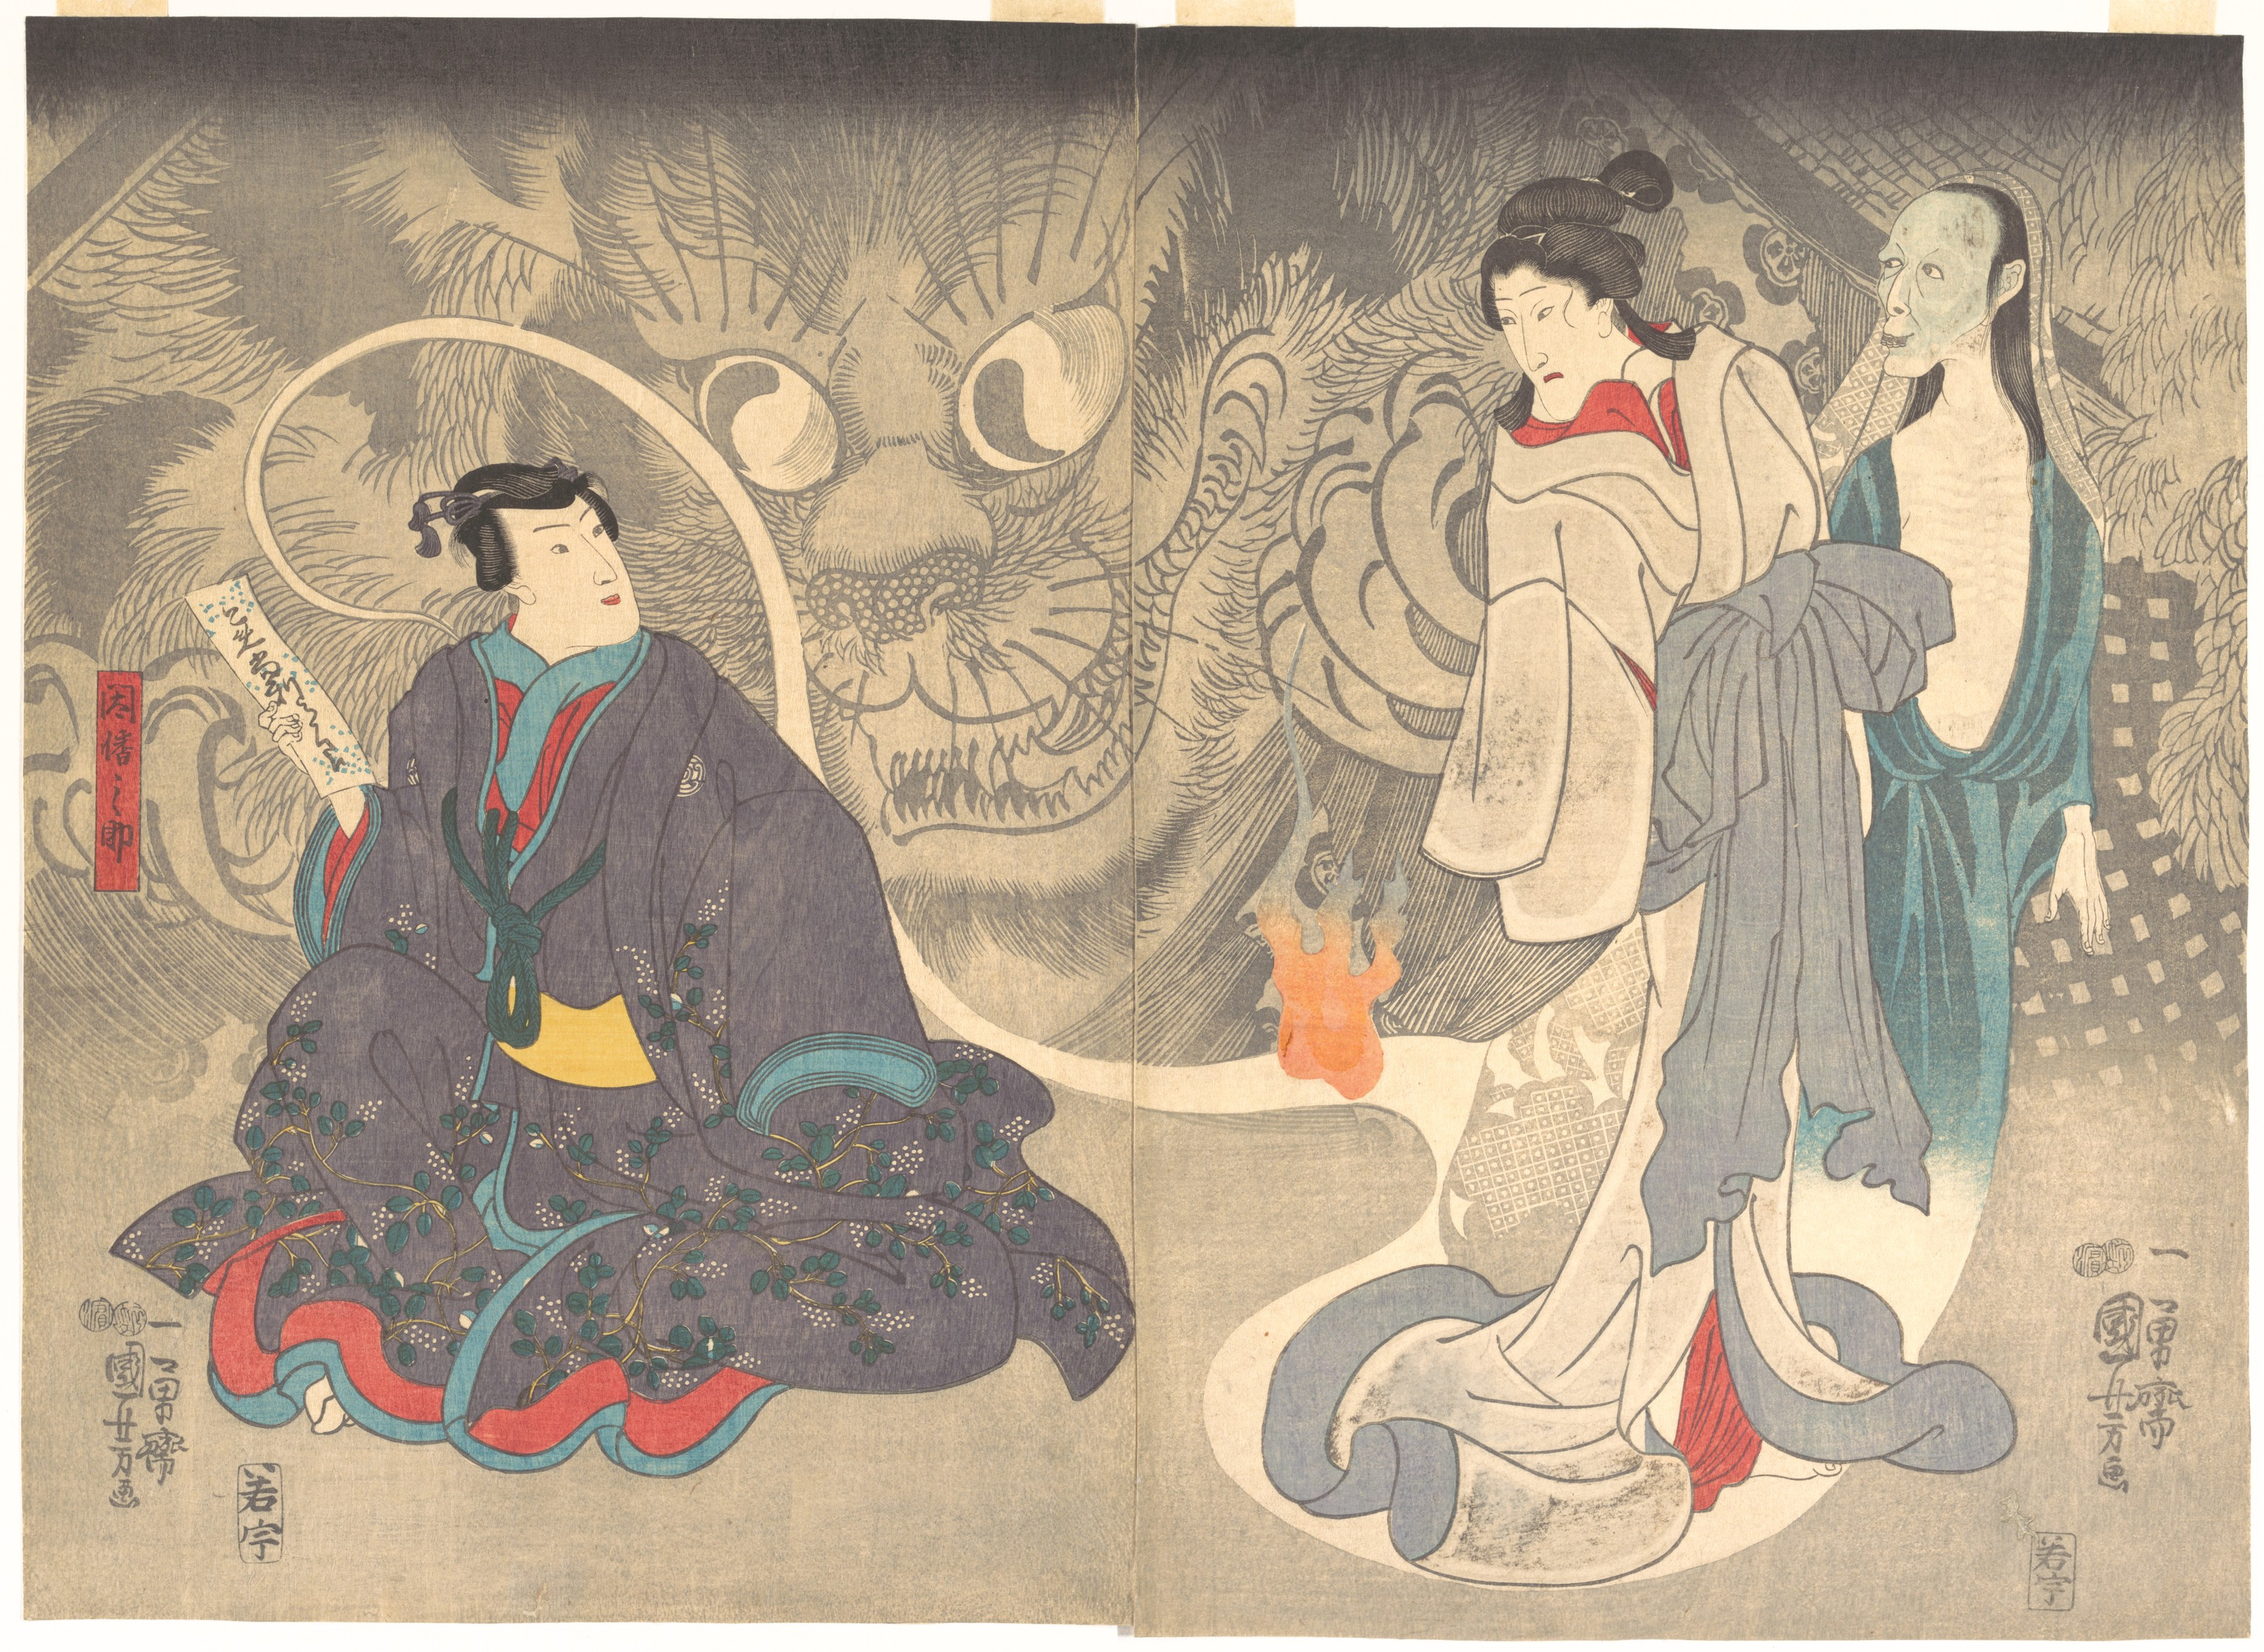 Utagawa Yuniyoshi's painting of a scene from a ghost story: the Okazaki cat demon.